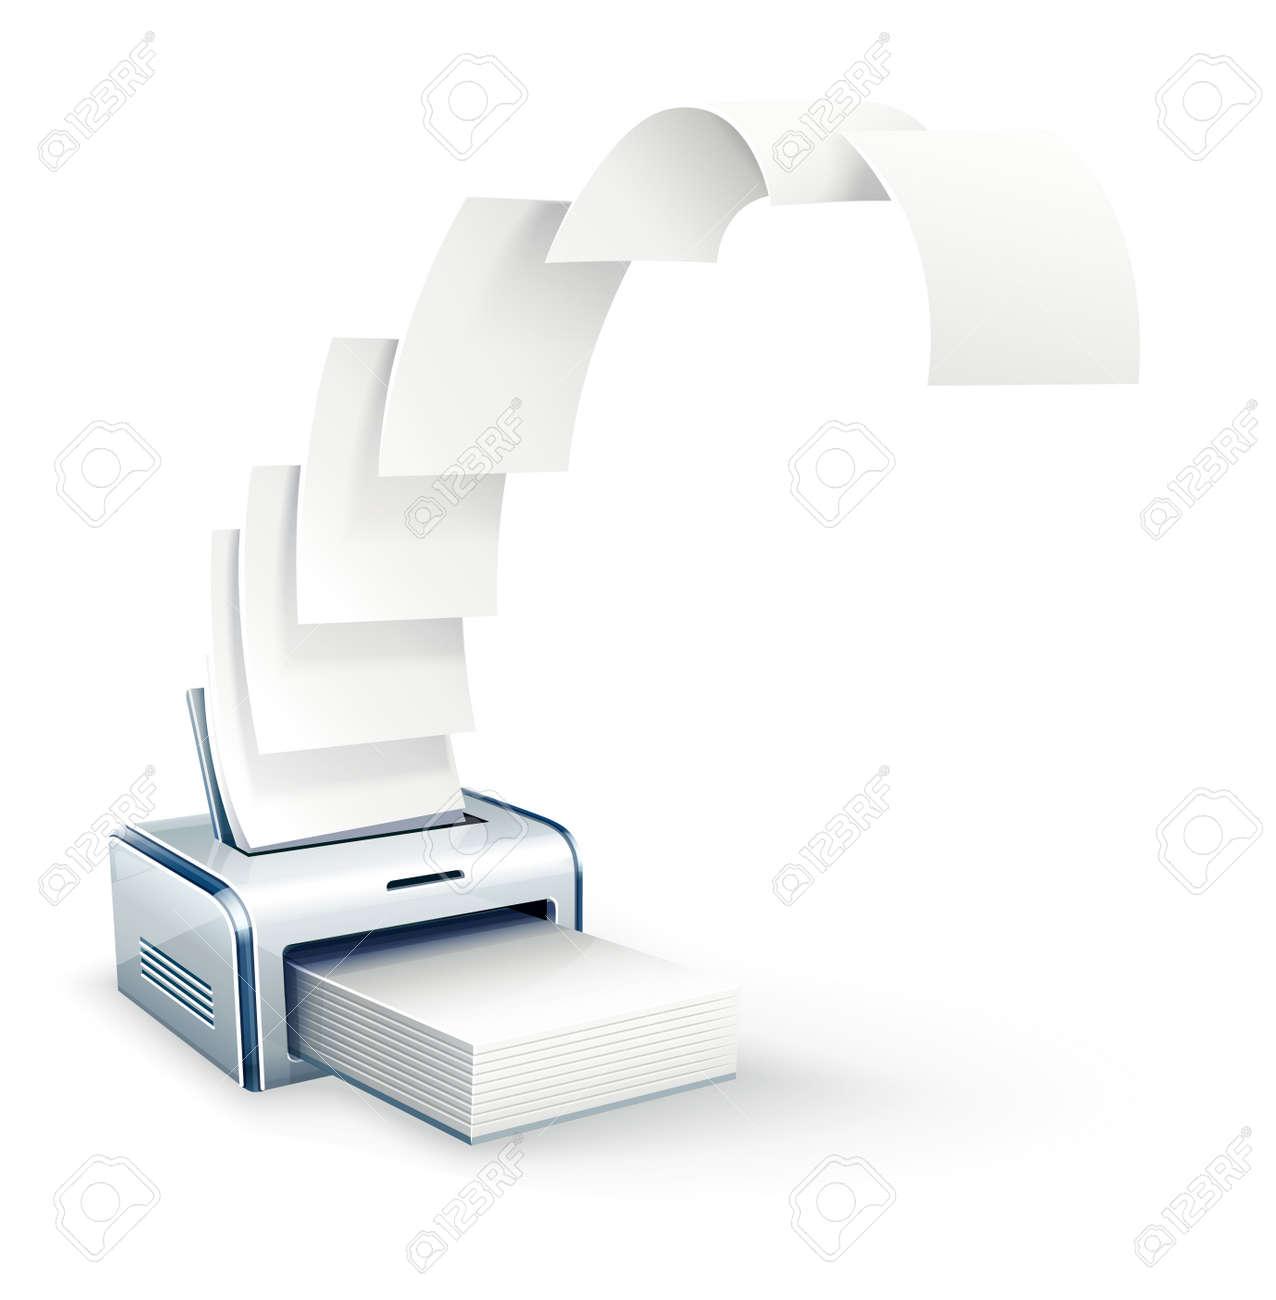 Printer printing copies to white paper - 54795610